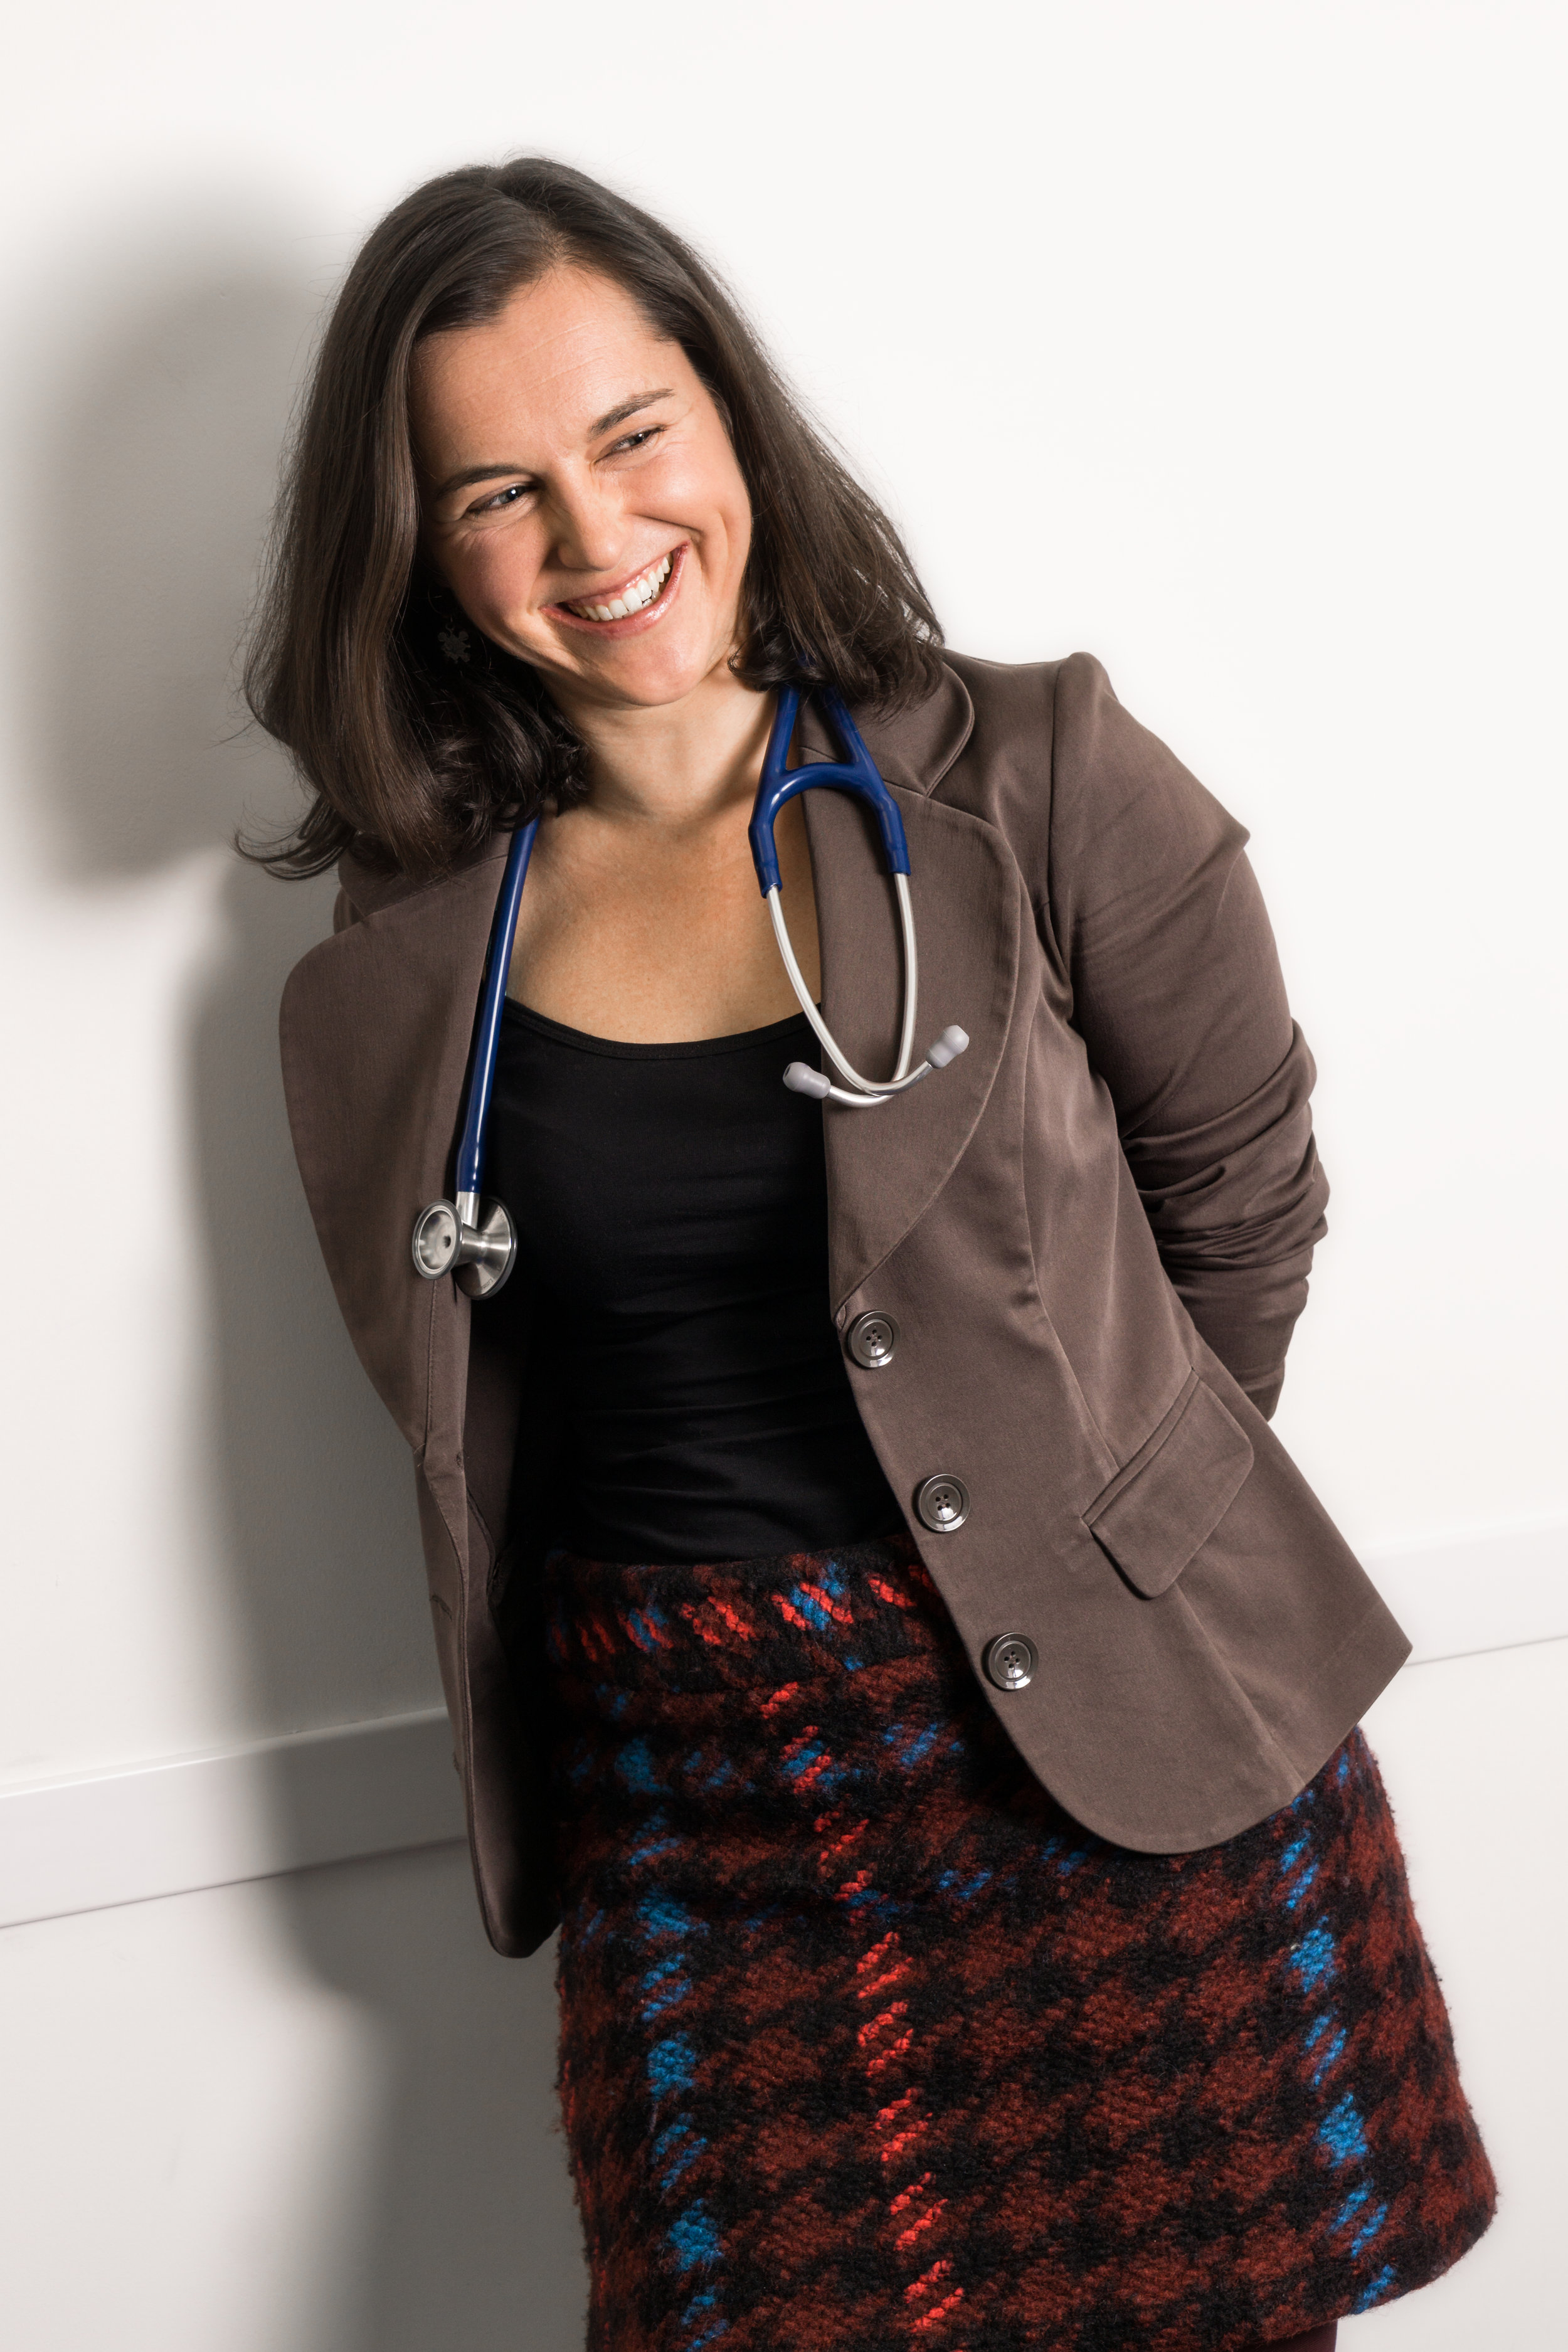 Heather_Thomson - Clinic Portrait 5.jpeg